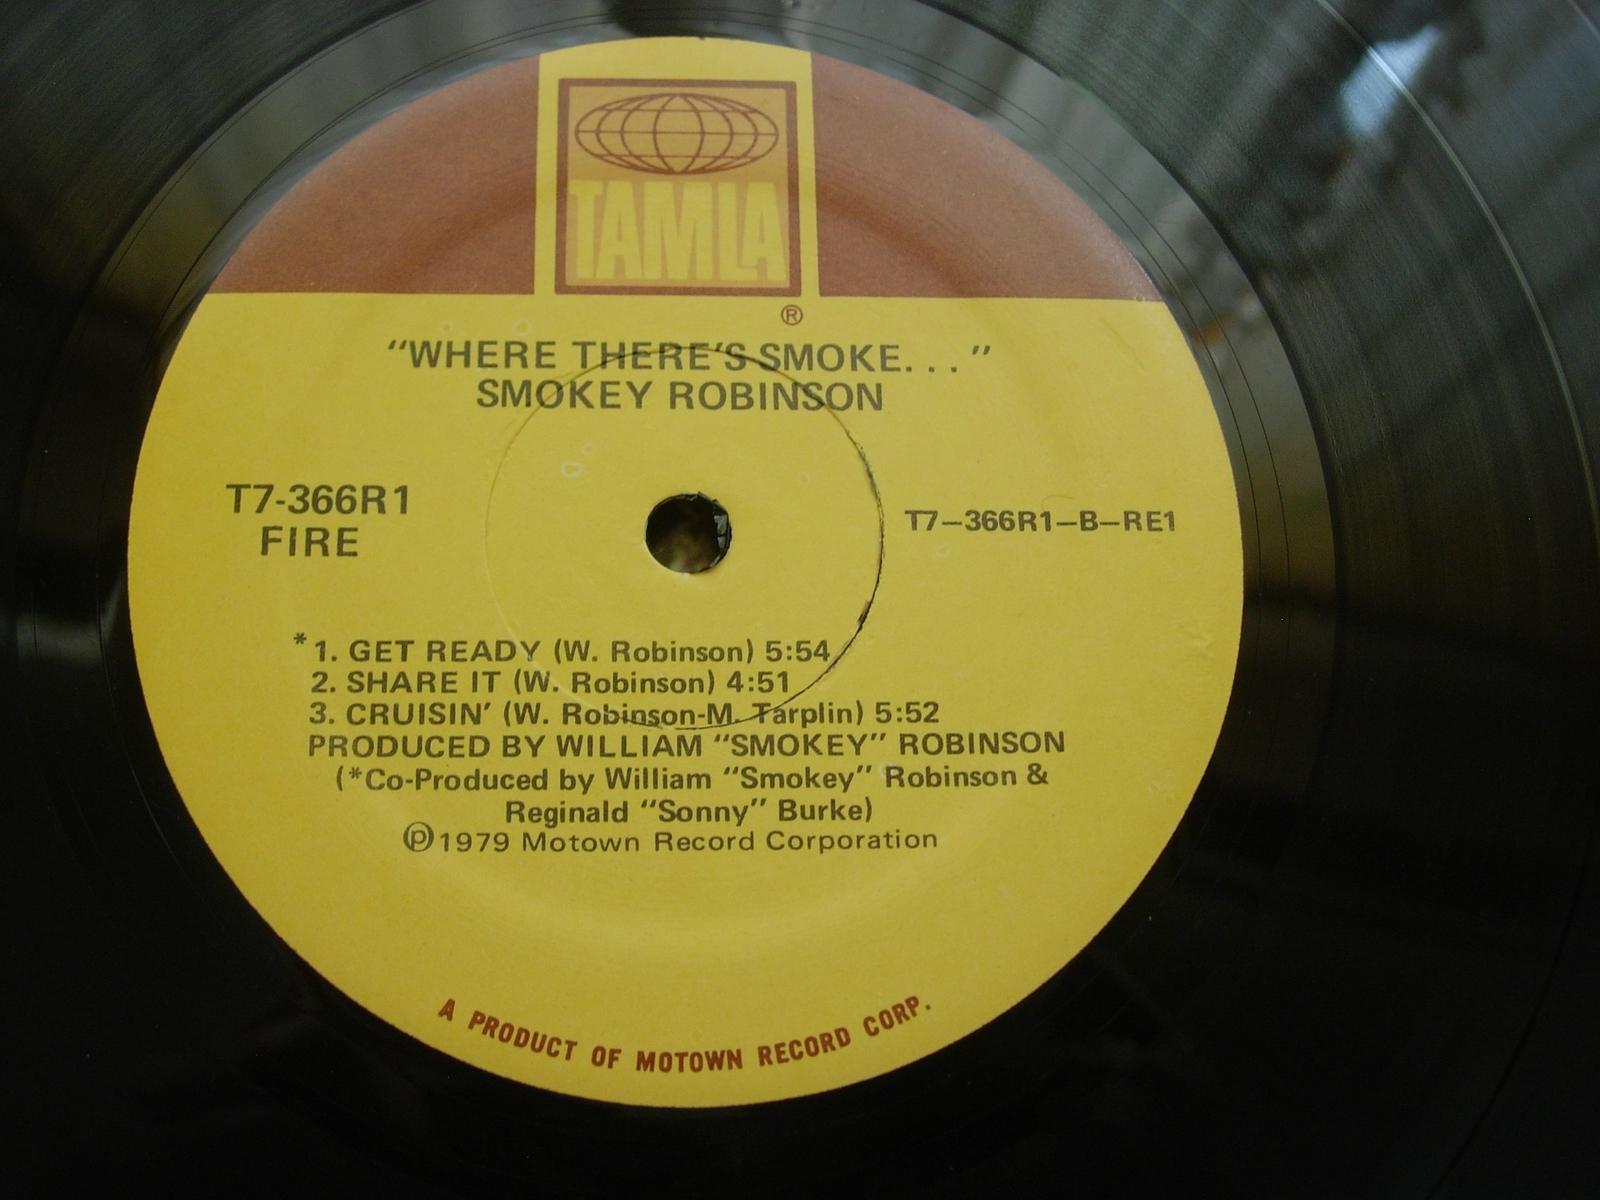 Smokey Robinson - Where There's Smoke - Tamia T7-366R1